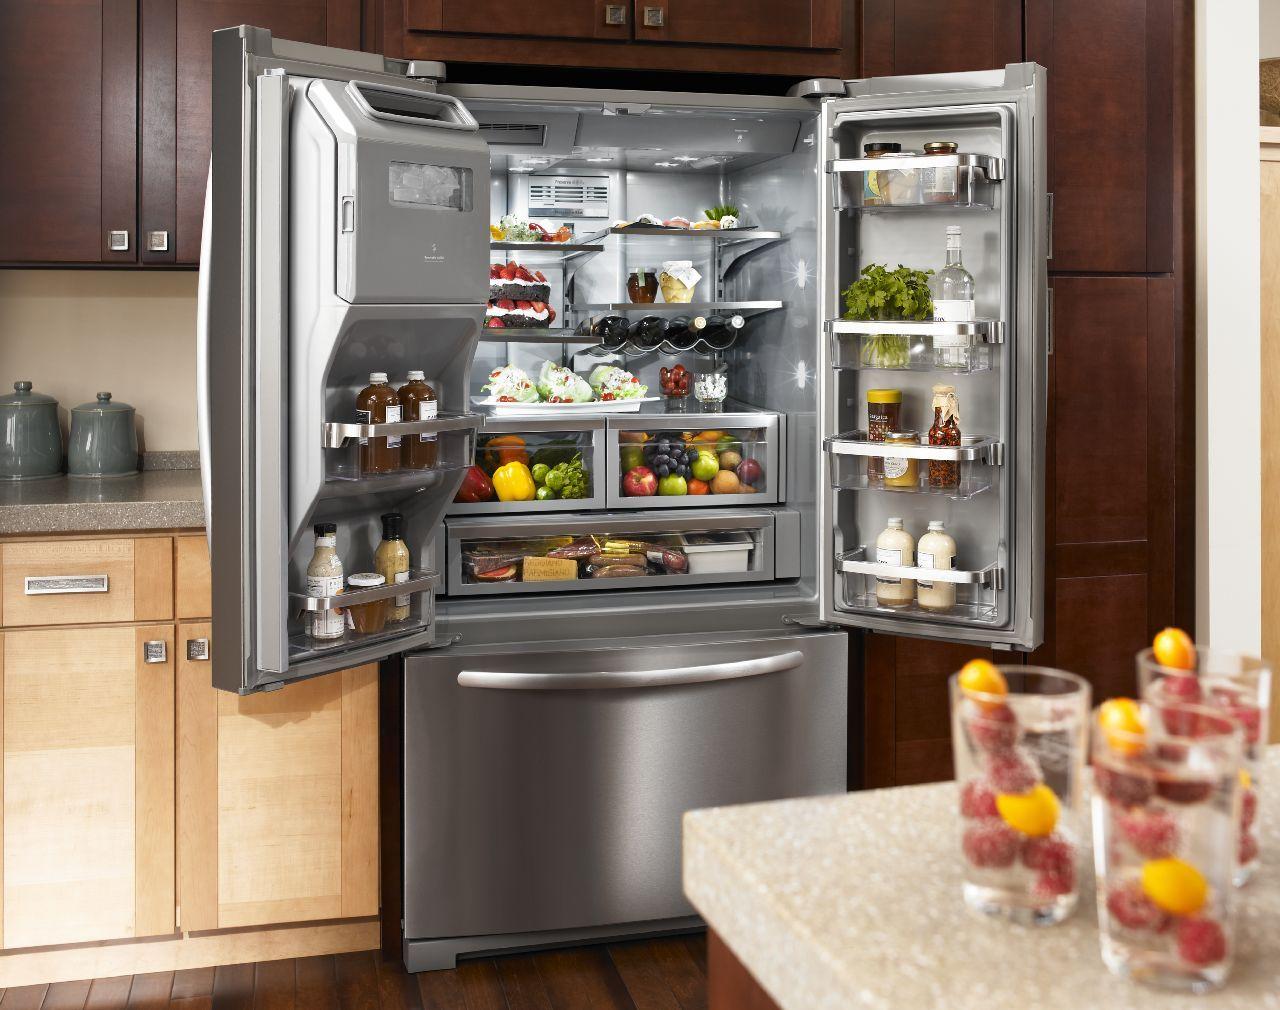 Giveaway Kitchenaid Refrigerator Worth Over 3 000